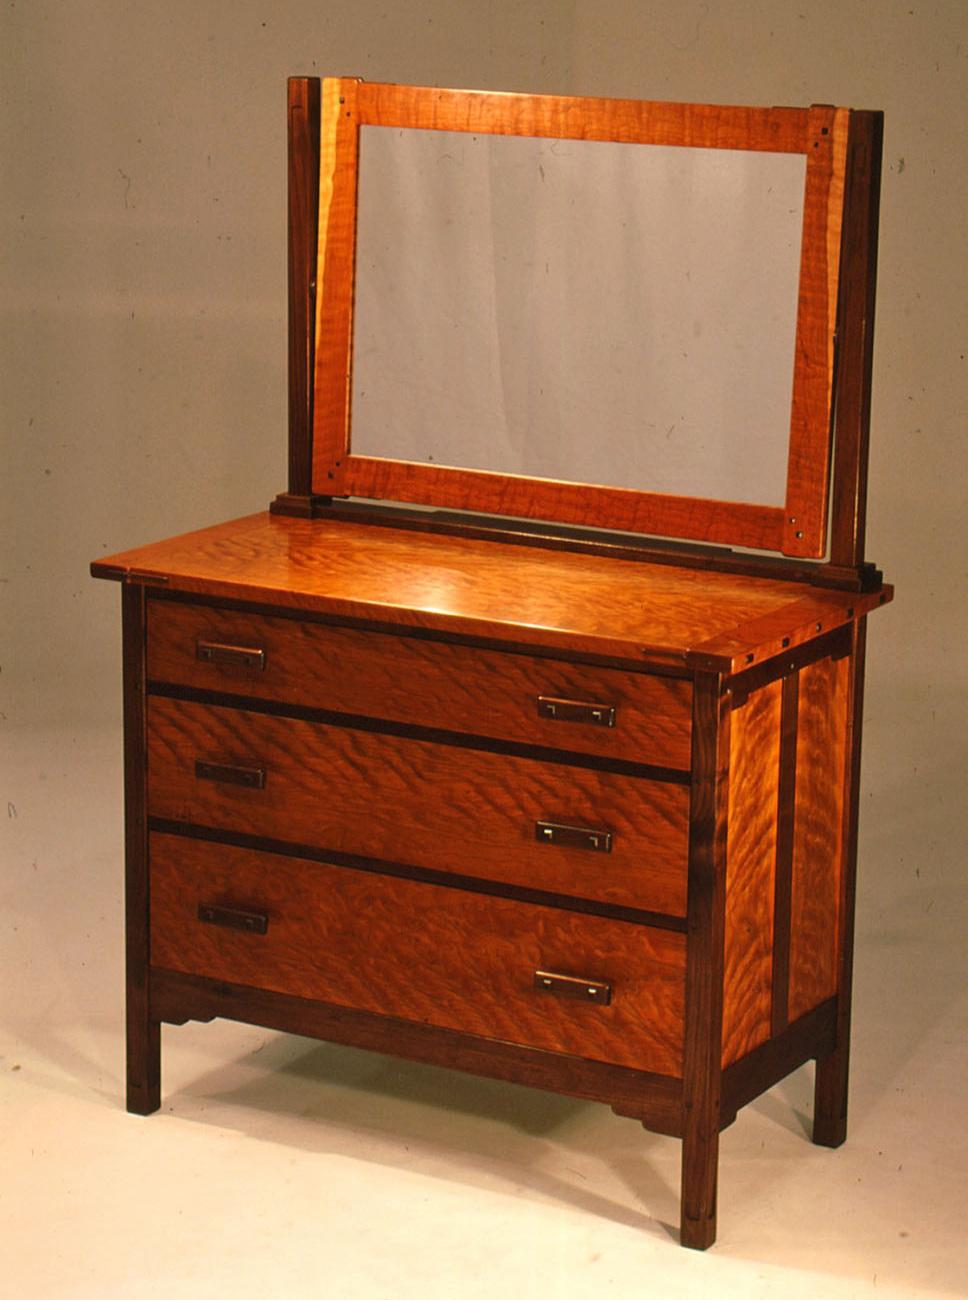 Walnut and Figured Cherry 3-Drawer Dresser with Mirror